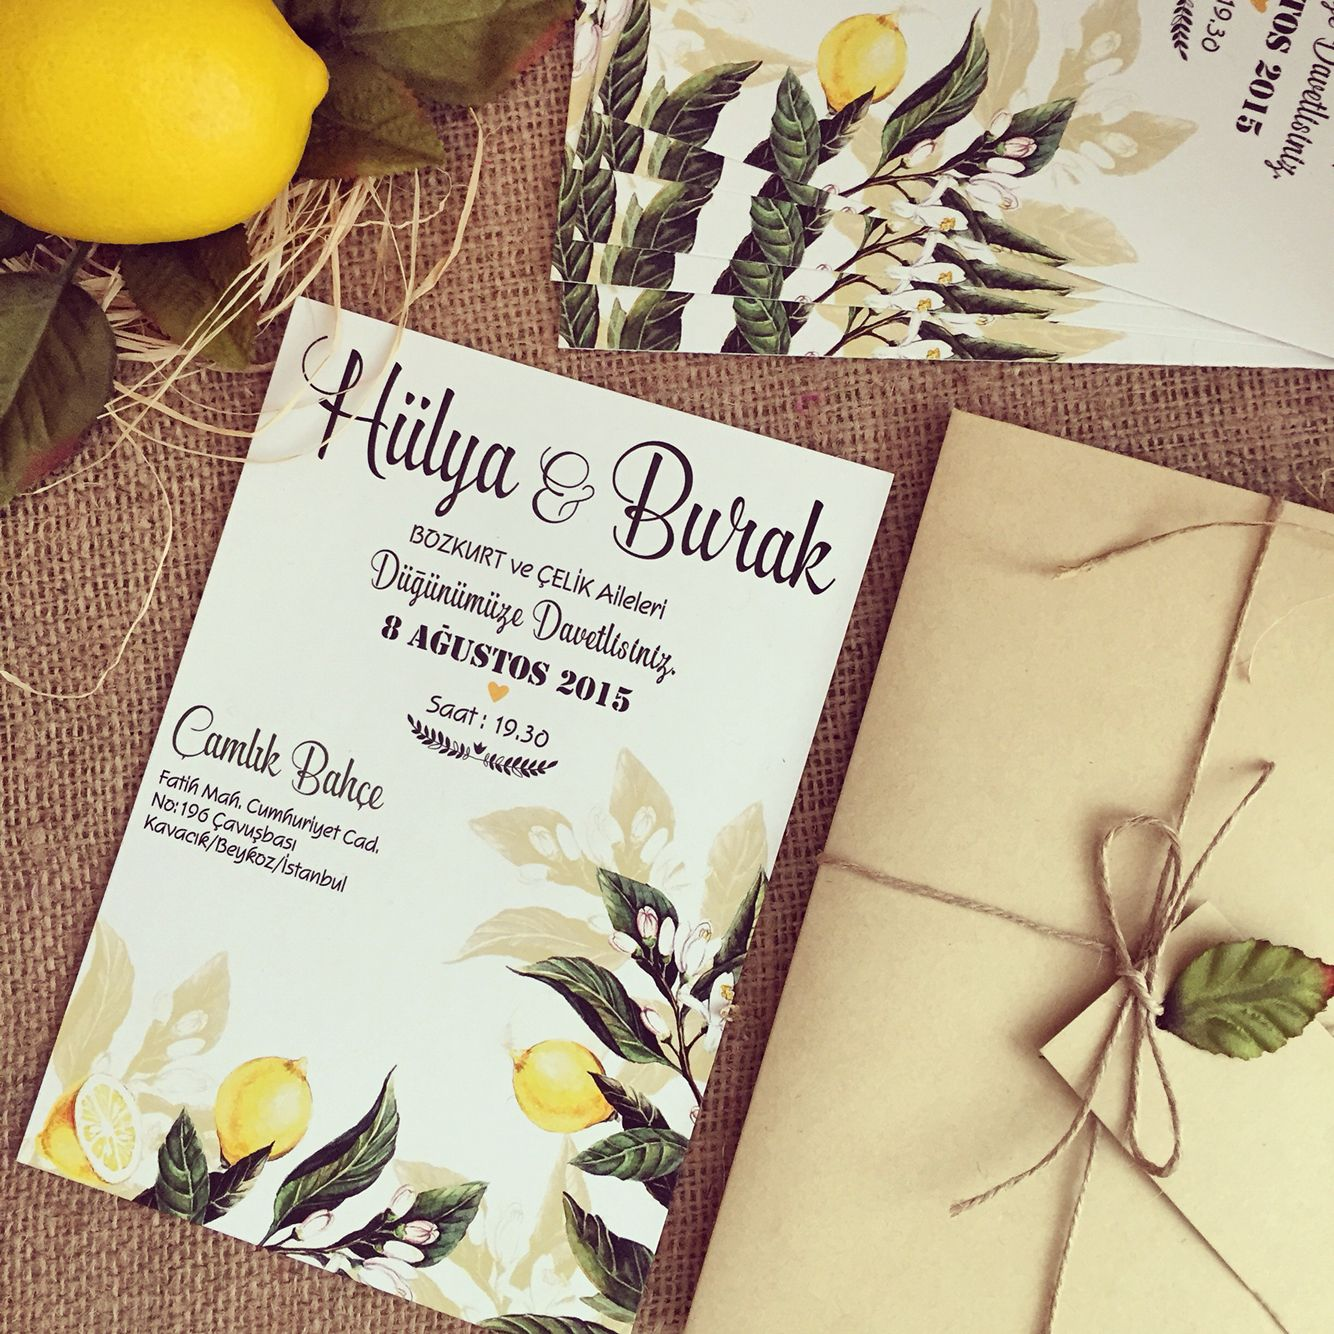 Limon konseptli davetiye / Wedding invitation with lemon www.masalsiatolye.com #masalsiatolye #davetiye #weddinginvitation #limon #lemon